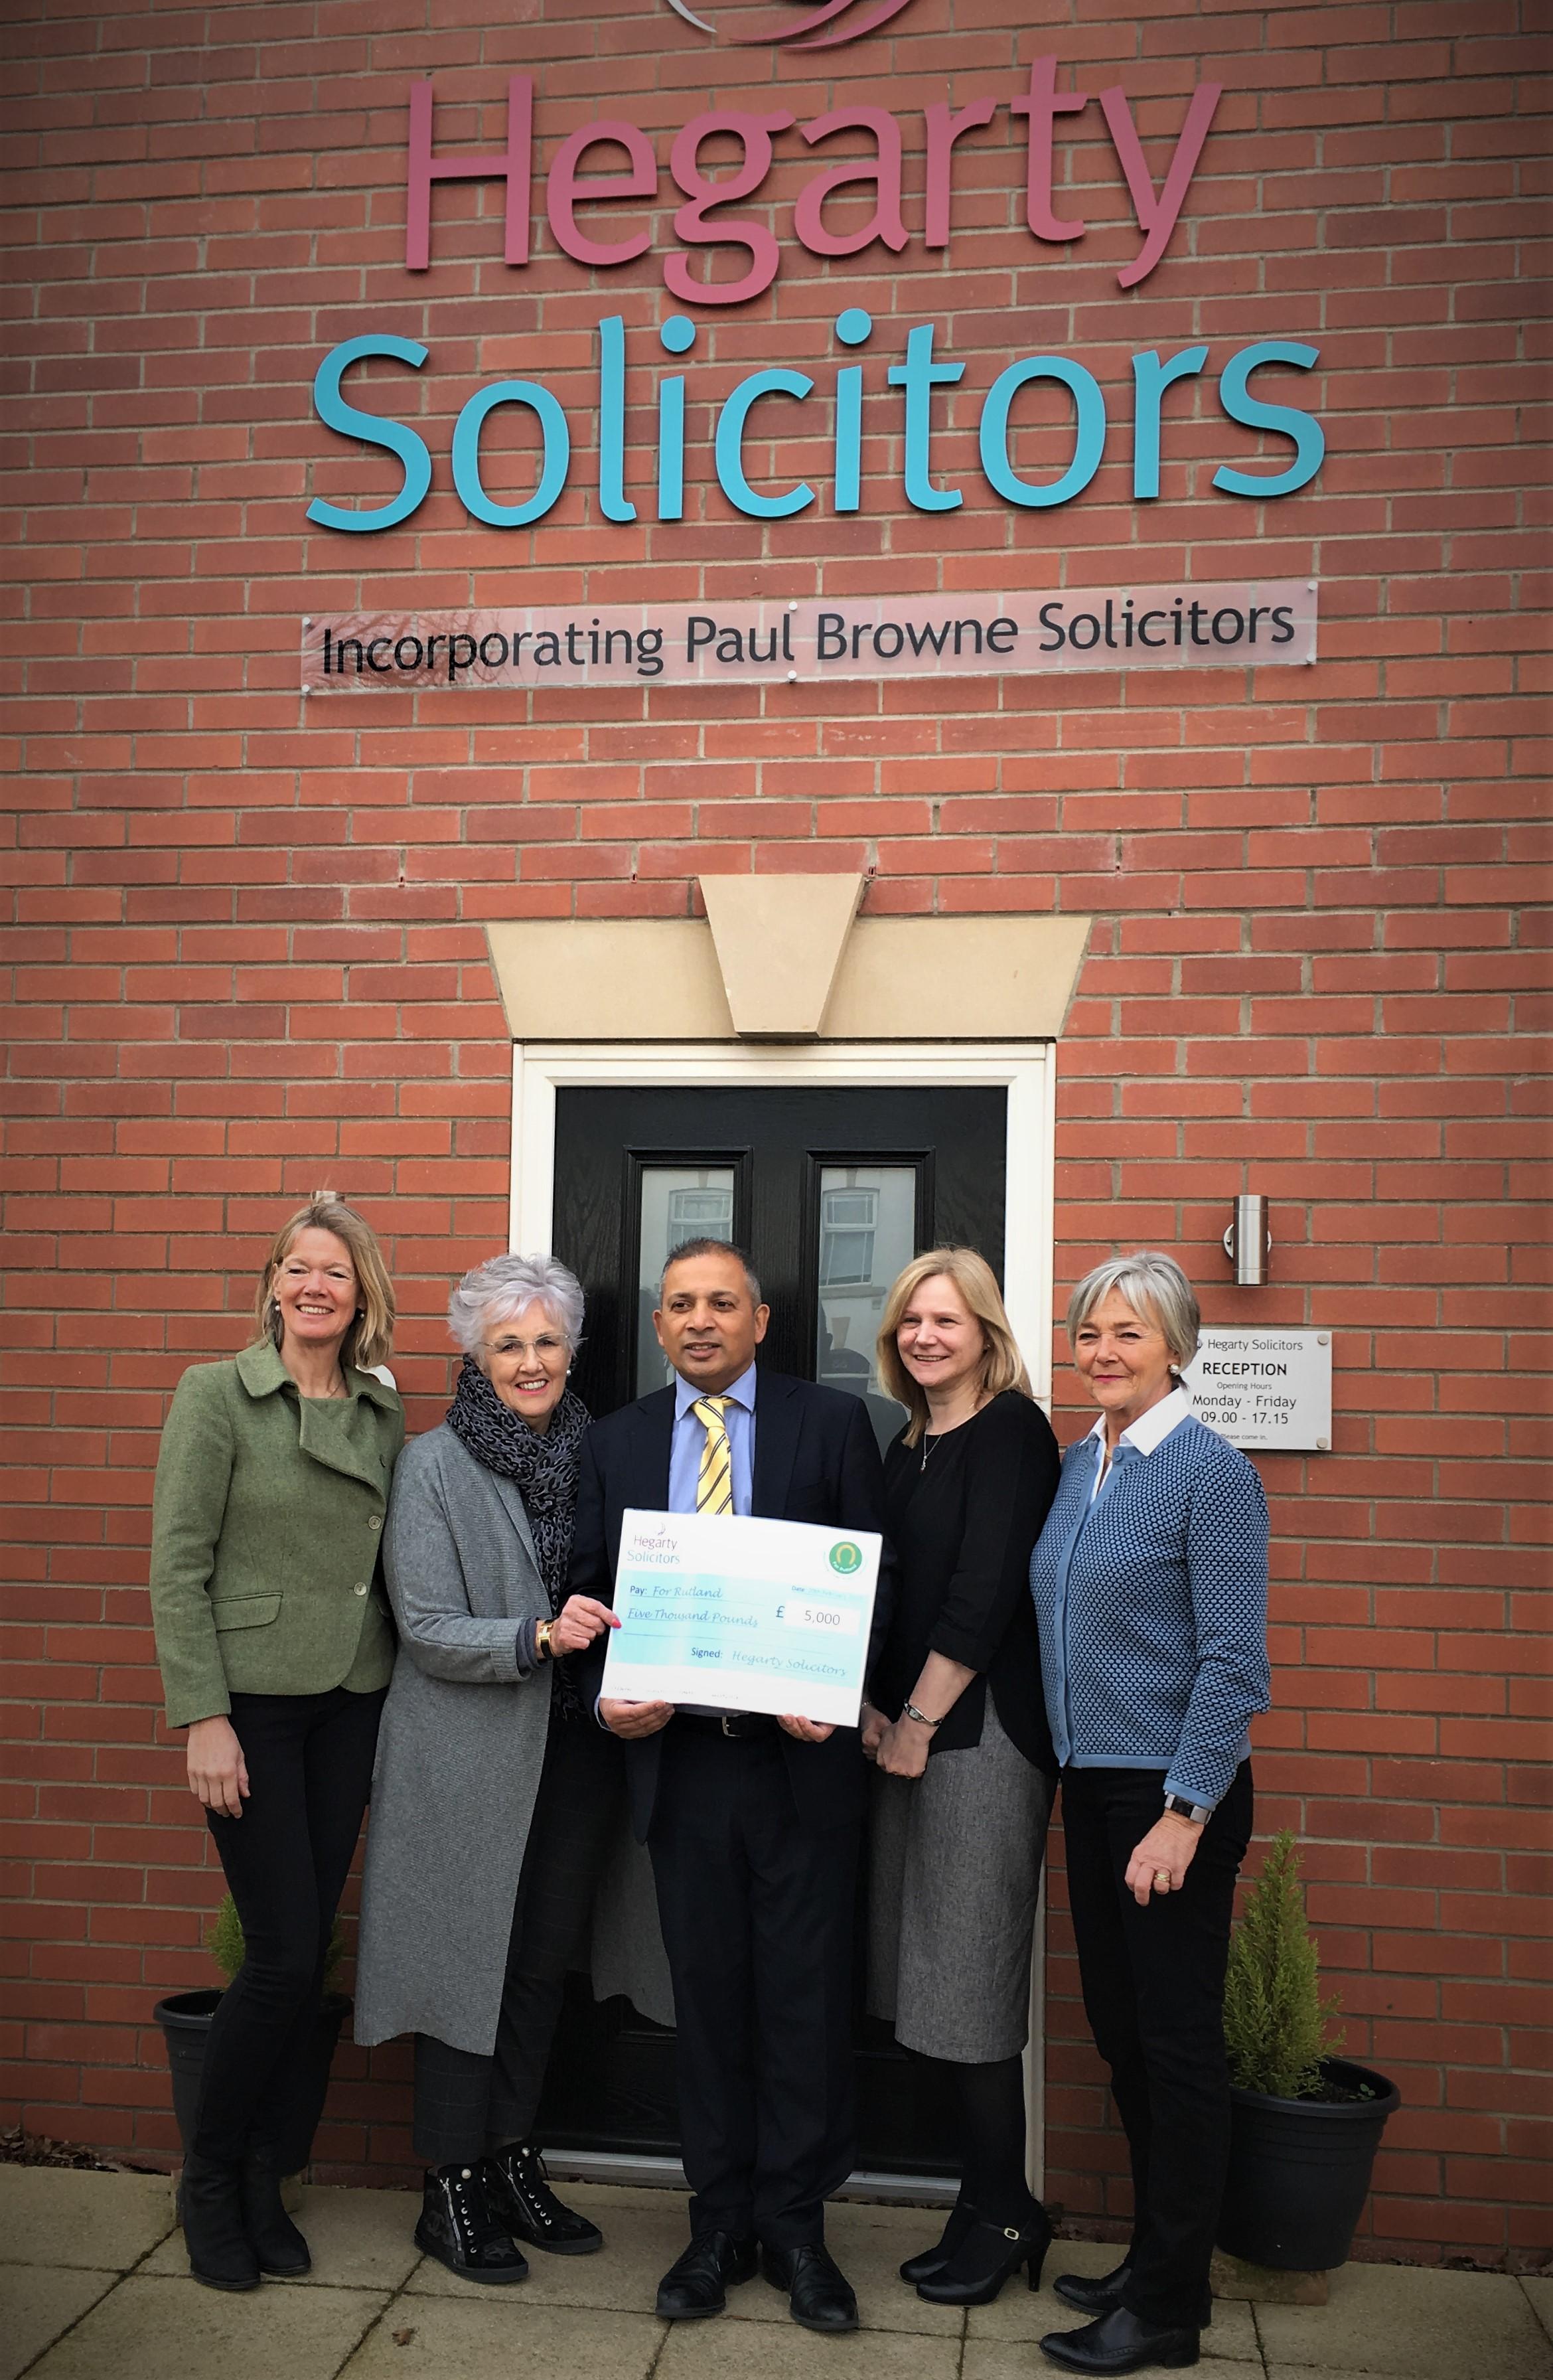 Hegarty Solicitors' marathon walk raises £5000 for local charity